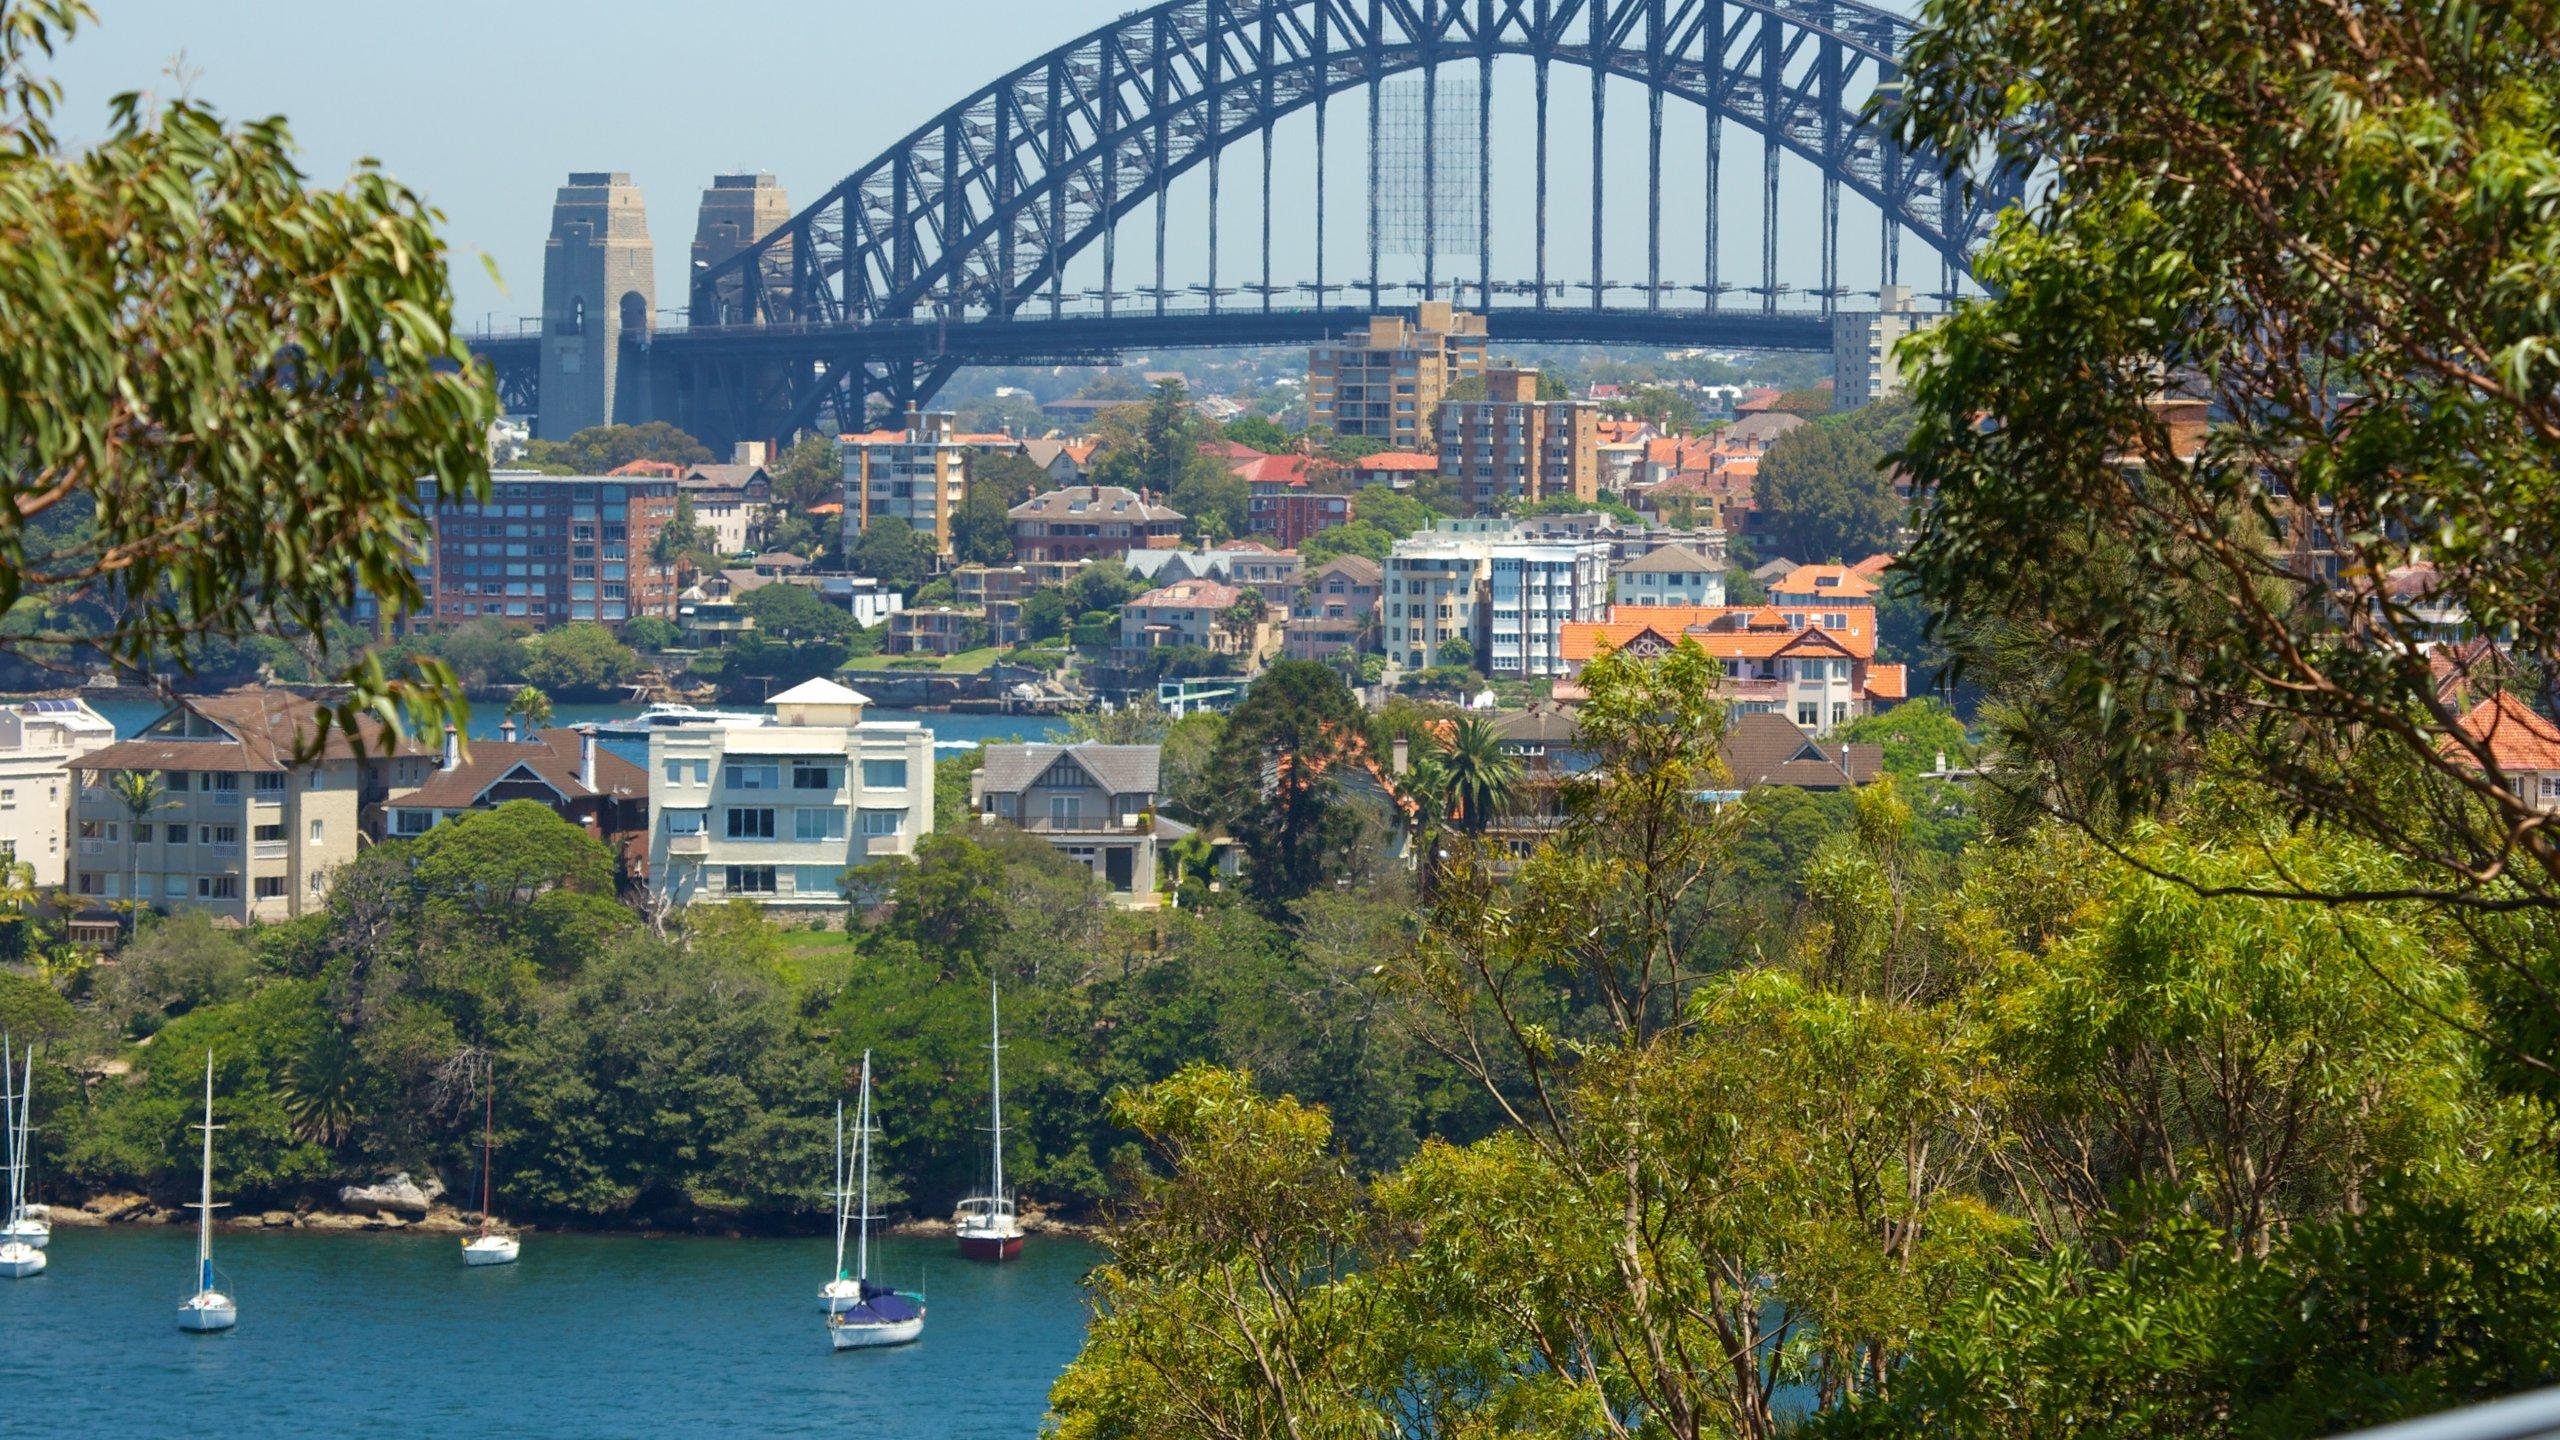 Mosman, Sydney, New South Wales, Australia